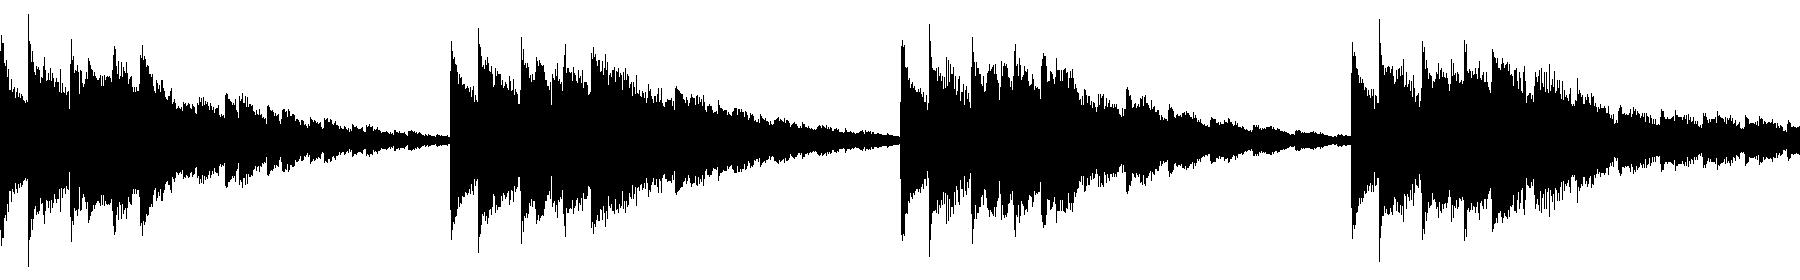 zttc synth loop 03 f 126 bpm